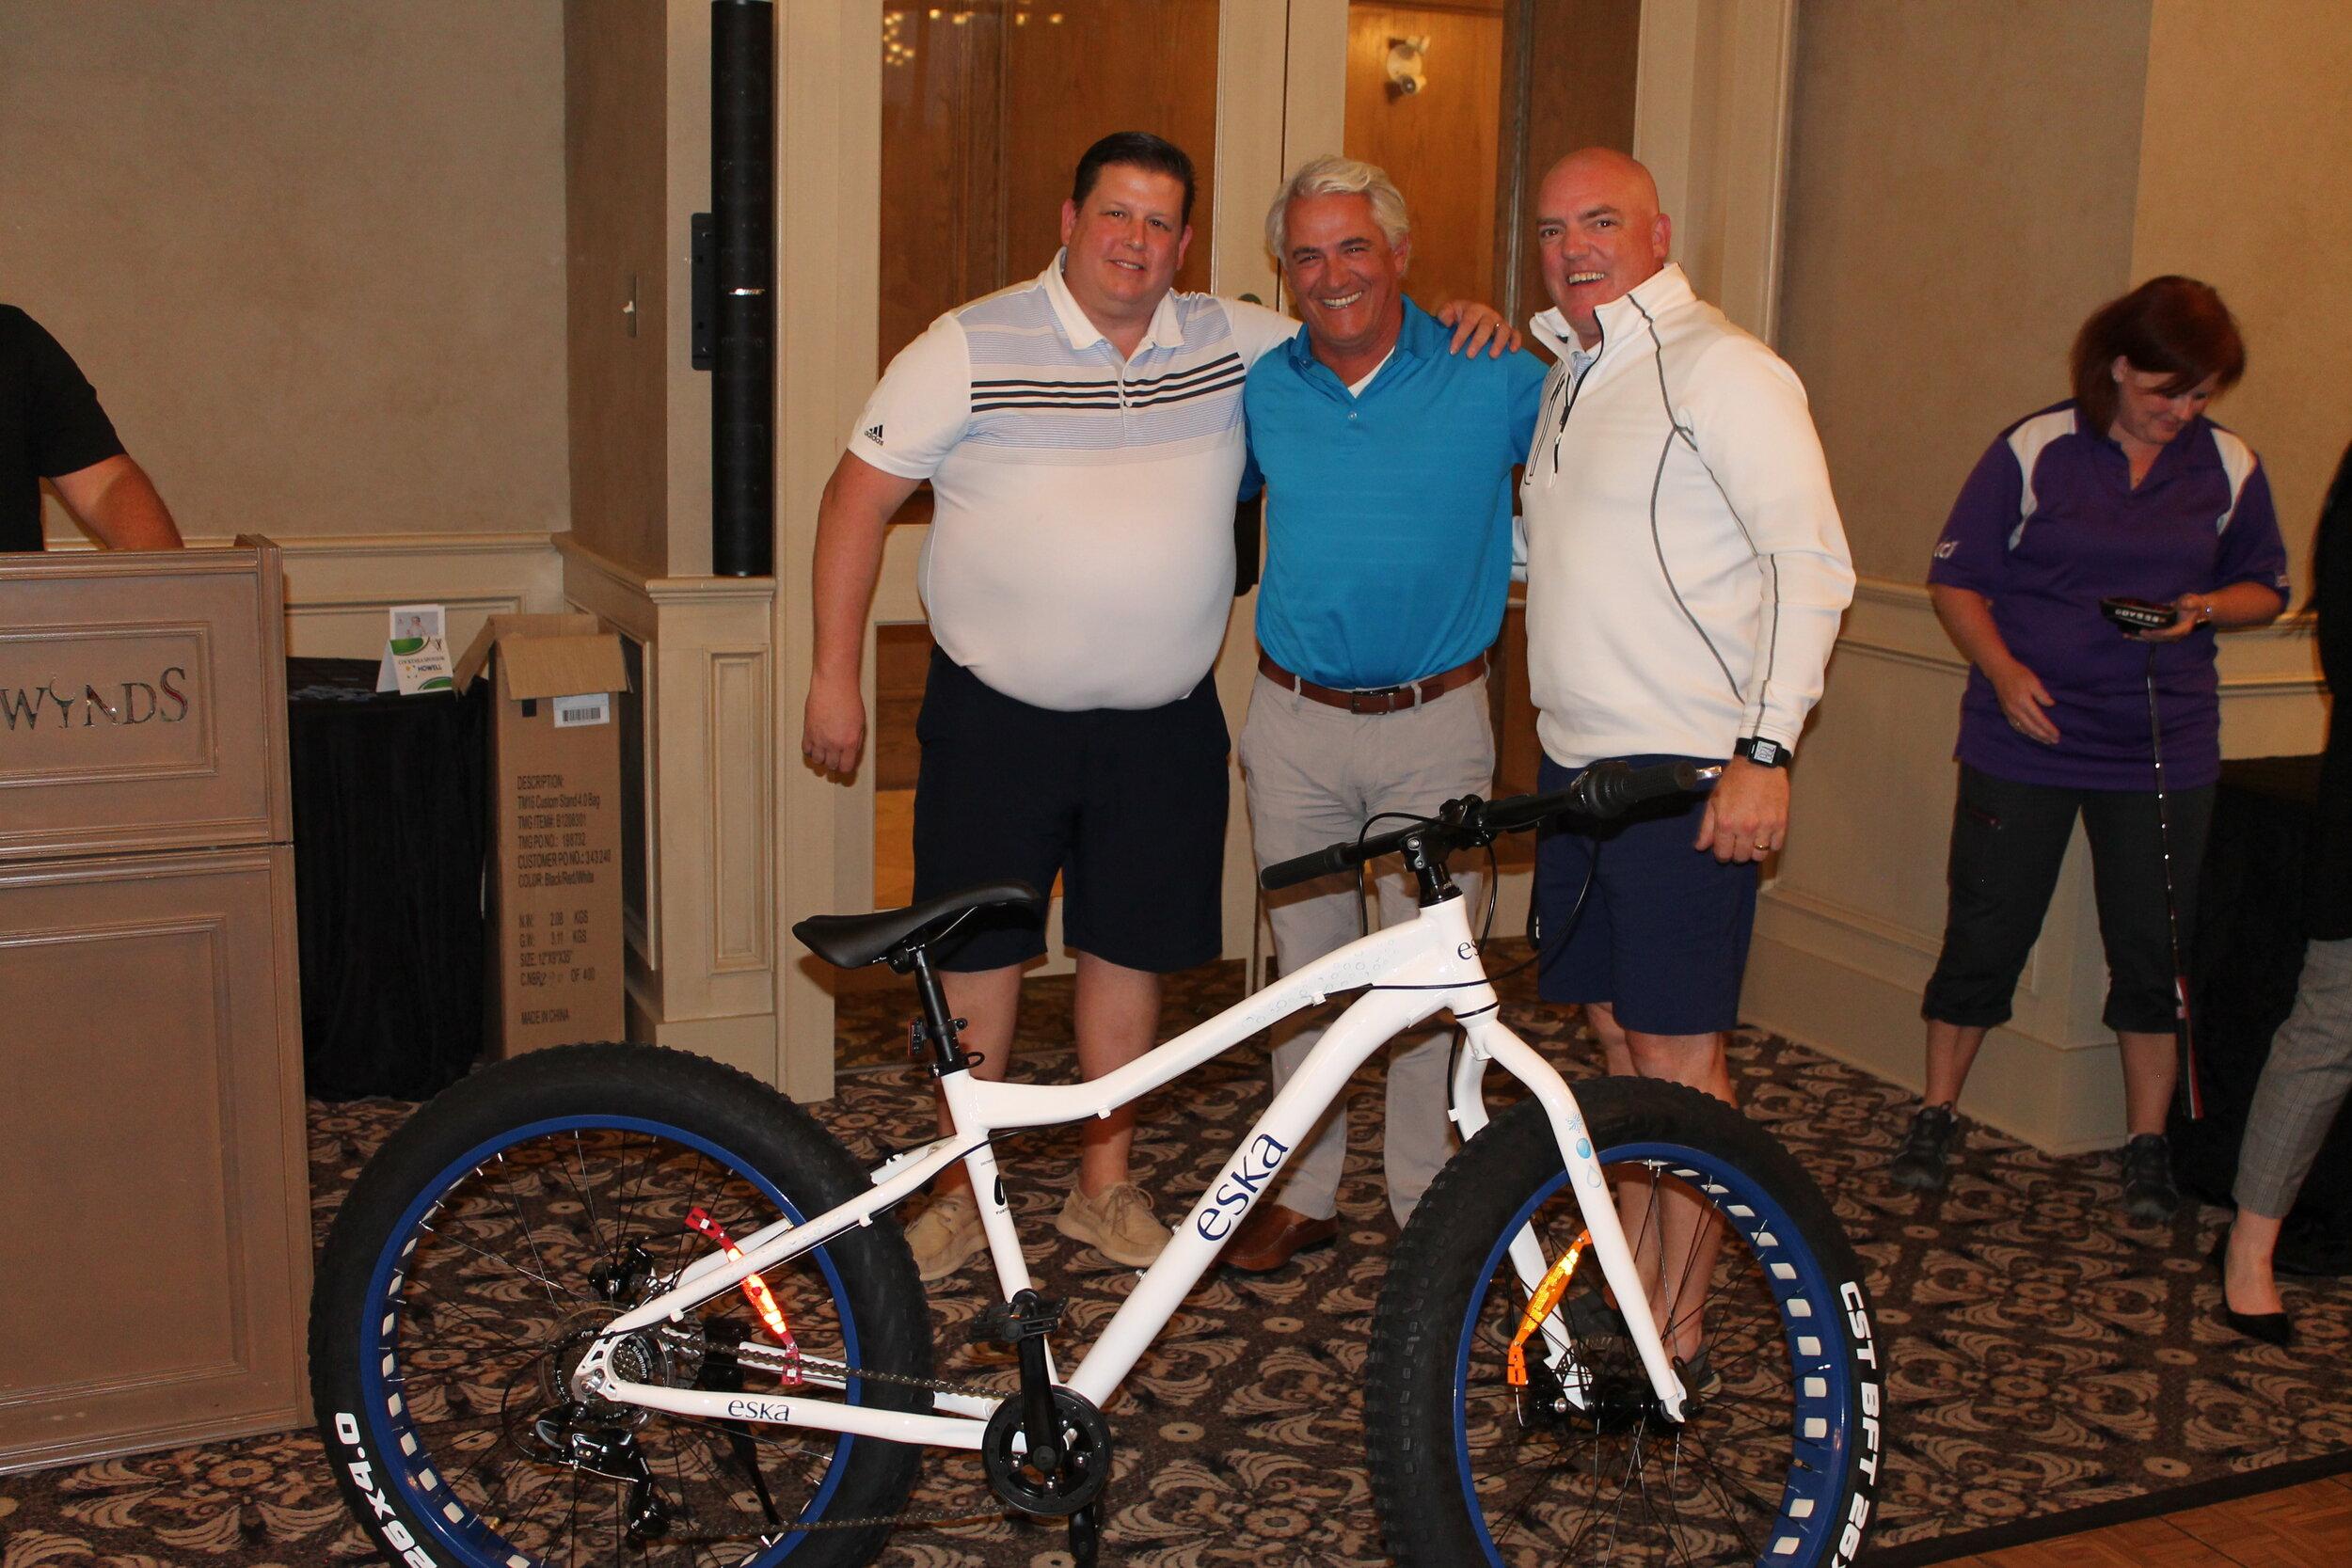 ESKA Water's Fat Bike